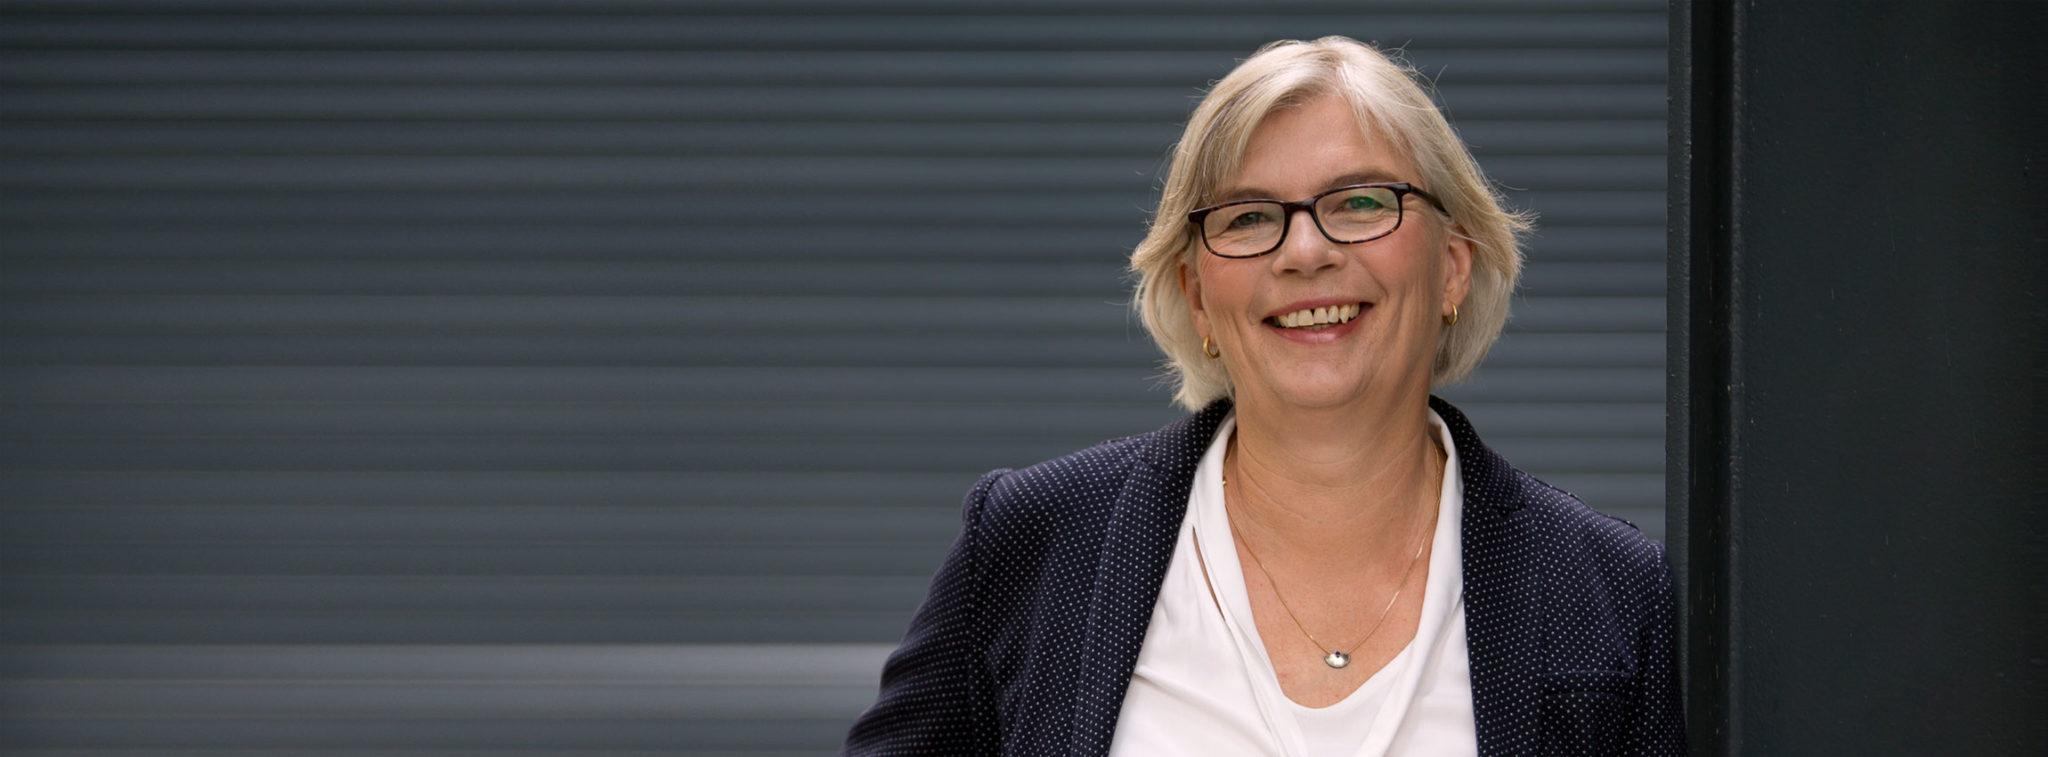 Rechtsanwältin Petra Laschat als Anwalt in Bad Aibling